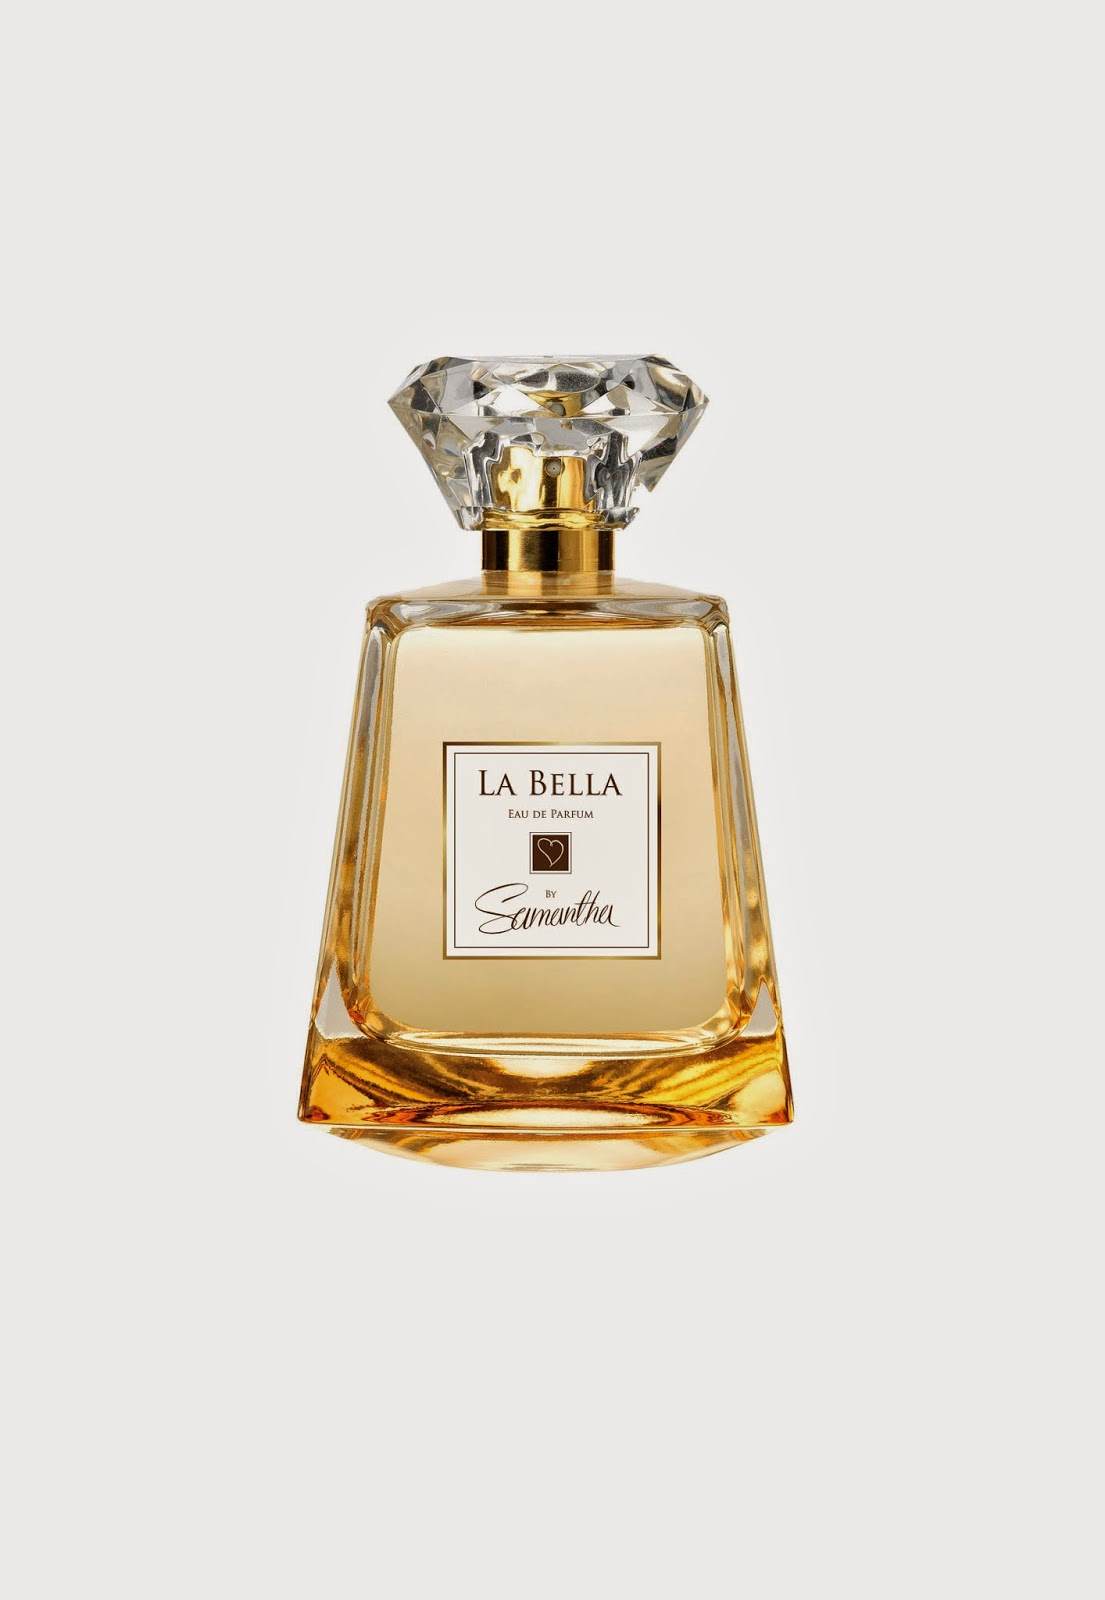 Sam Samantha Faiers Debut fragrance La Bella TOWIE